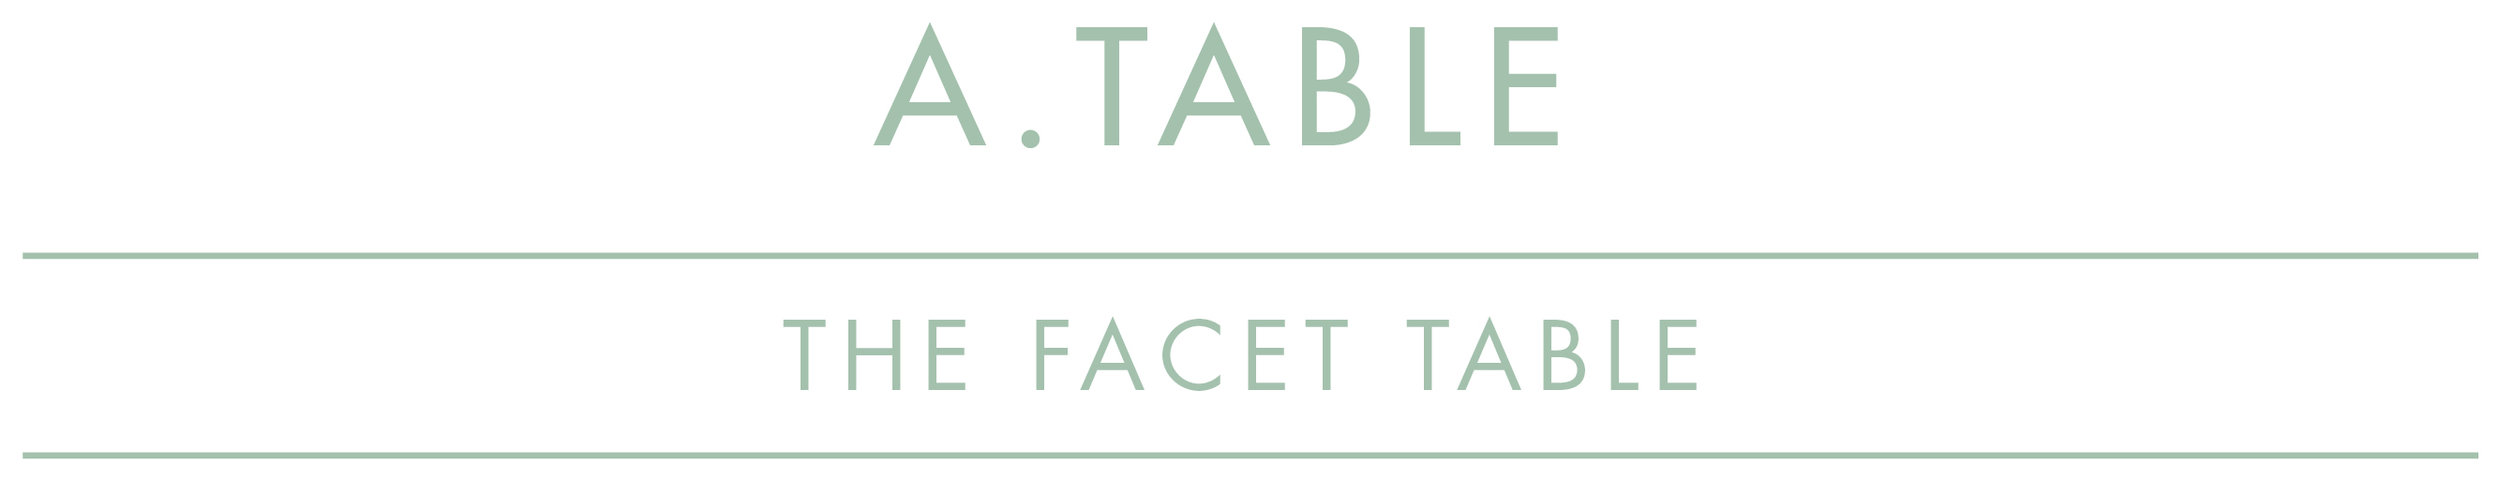 MOS Facet table_1.jpg